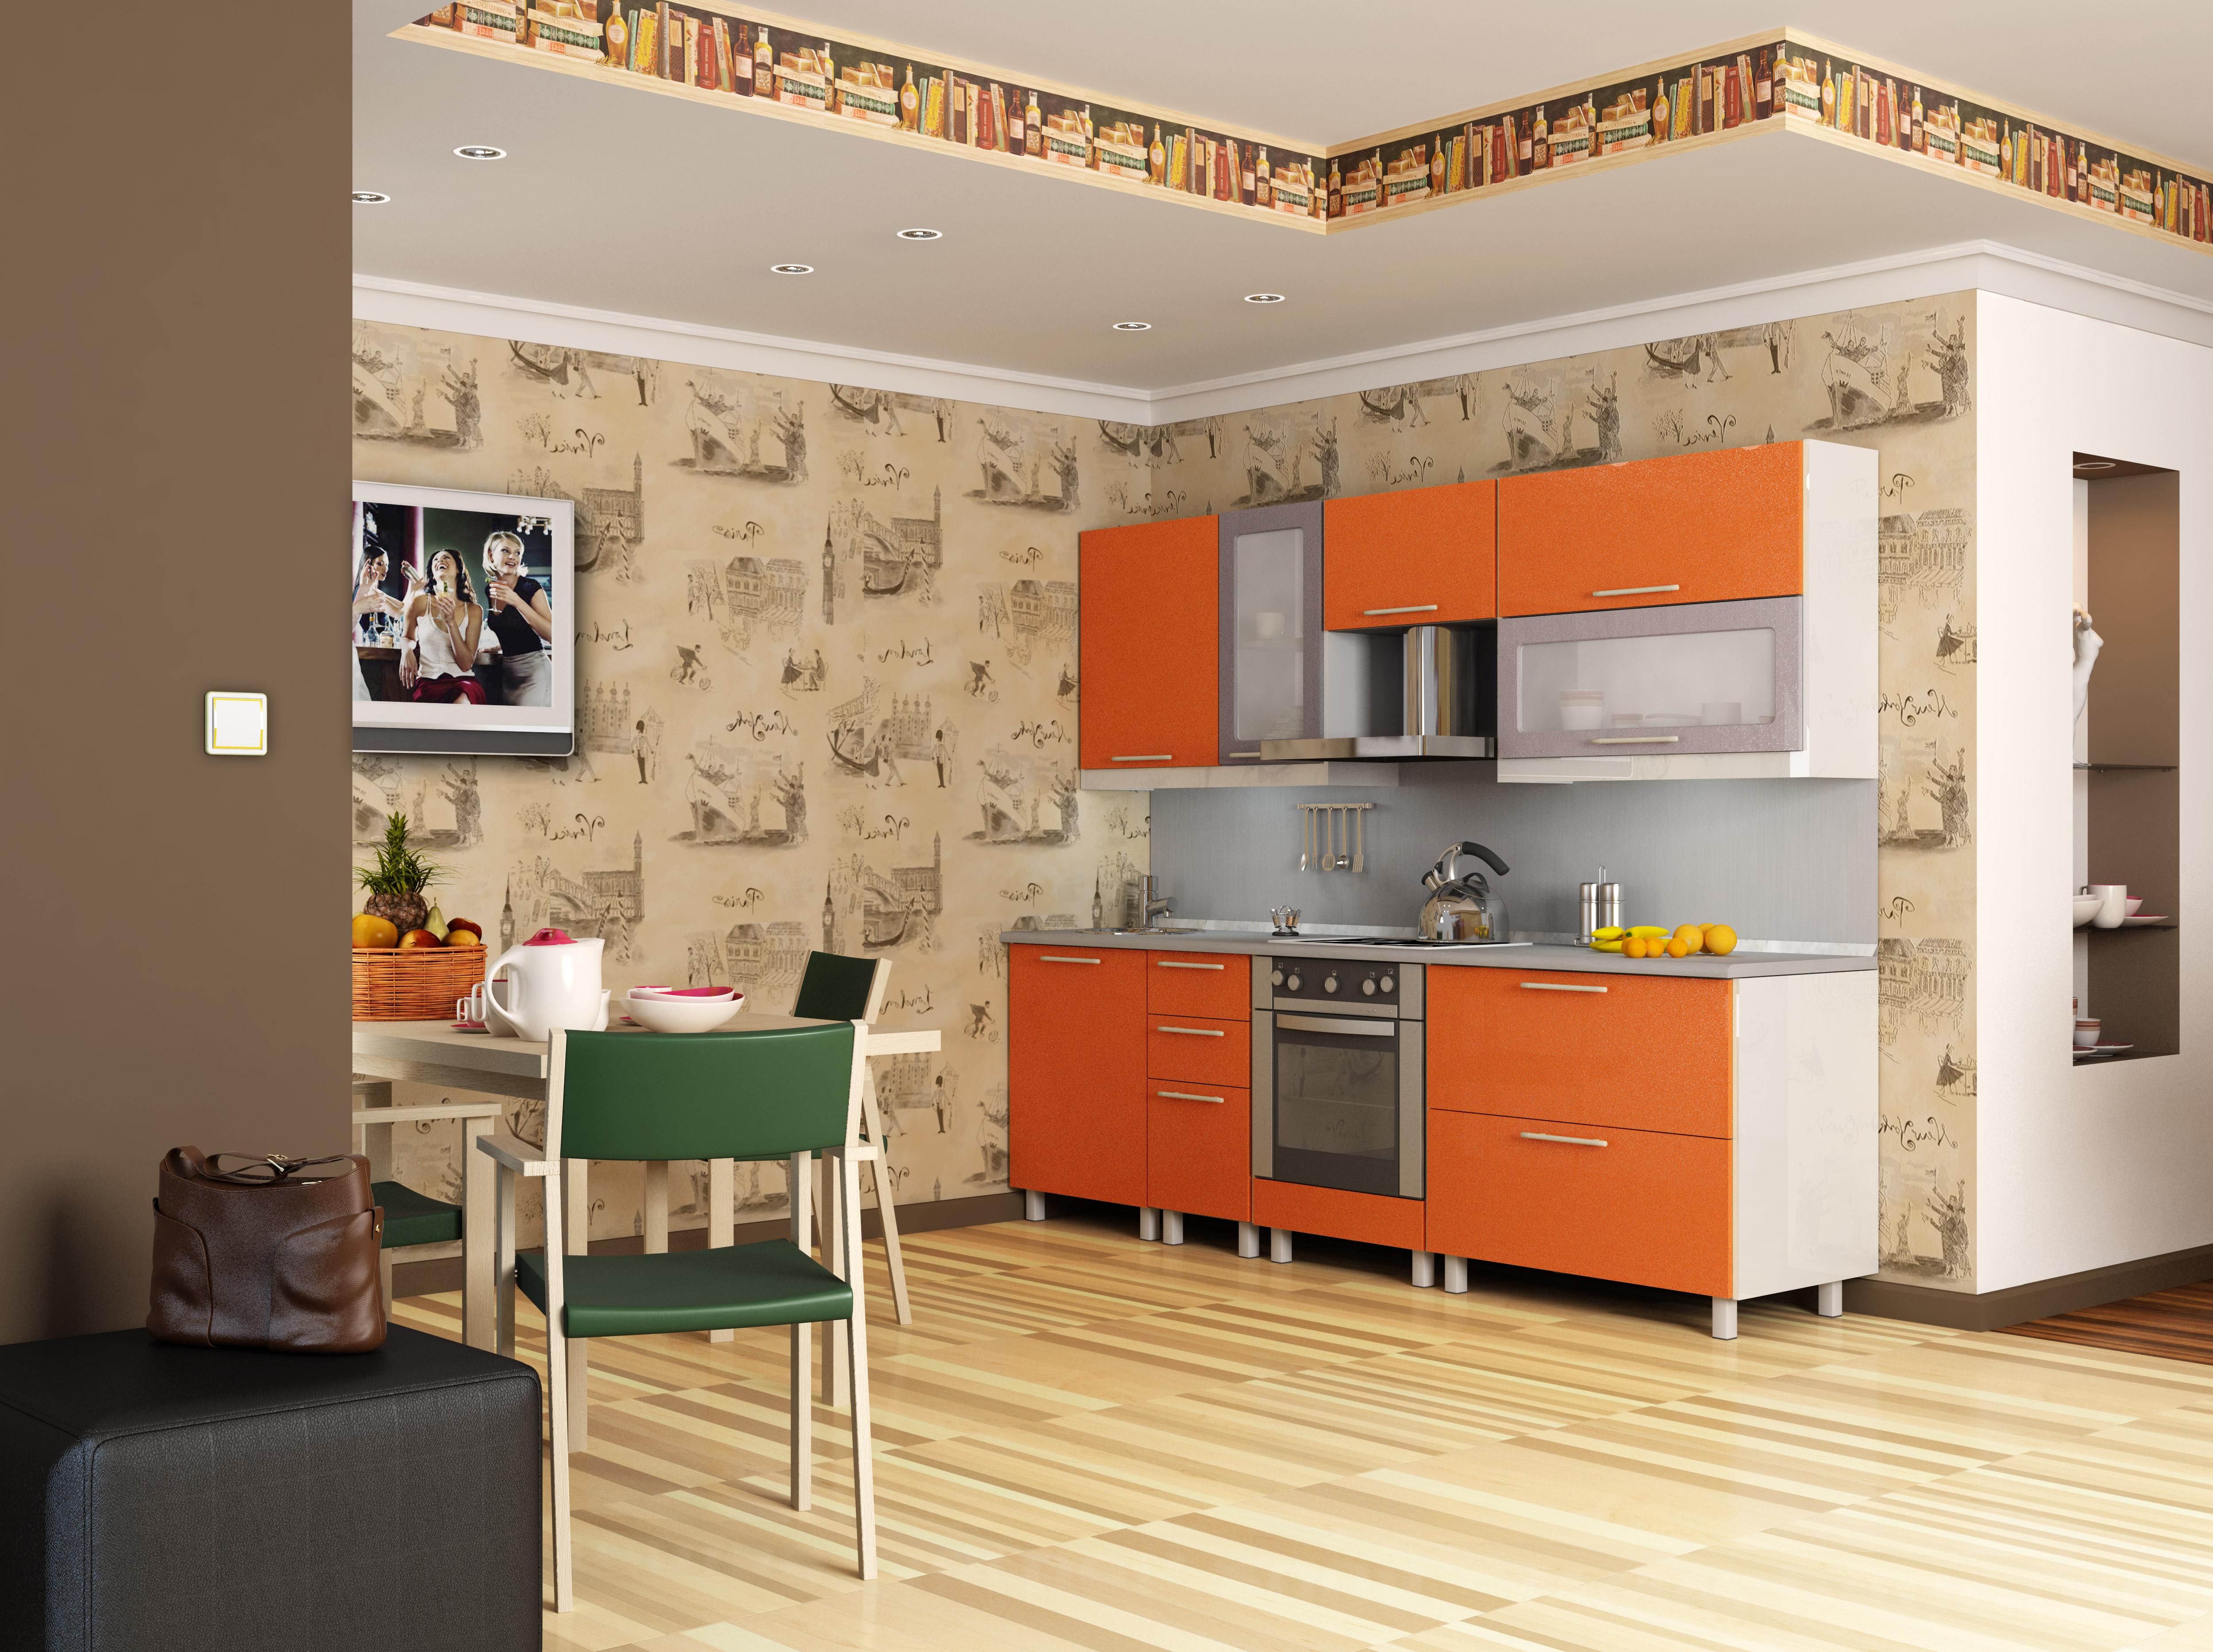 Кухня морковные фасады, белые торцы